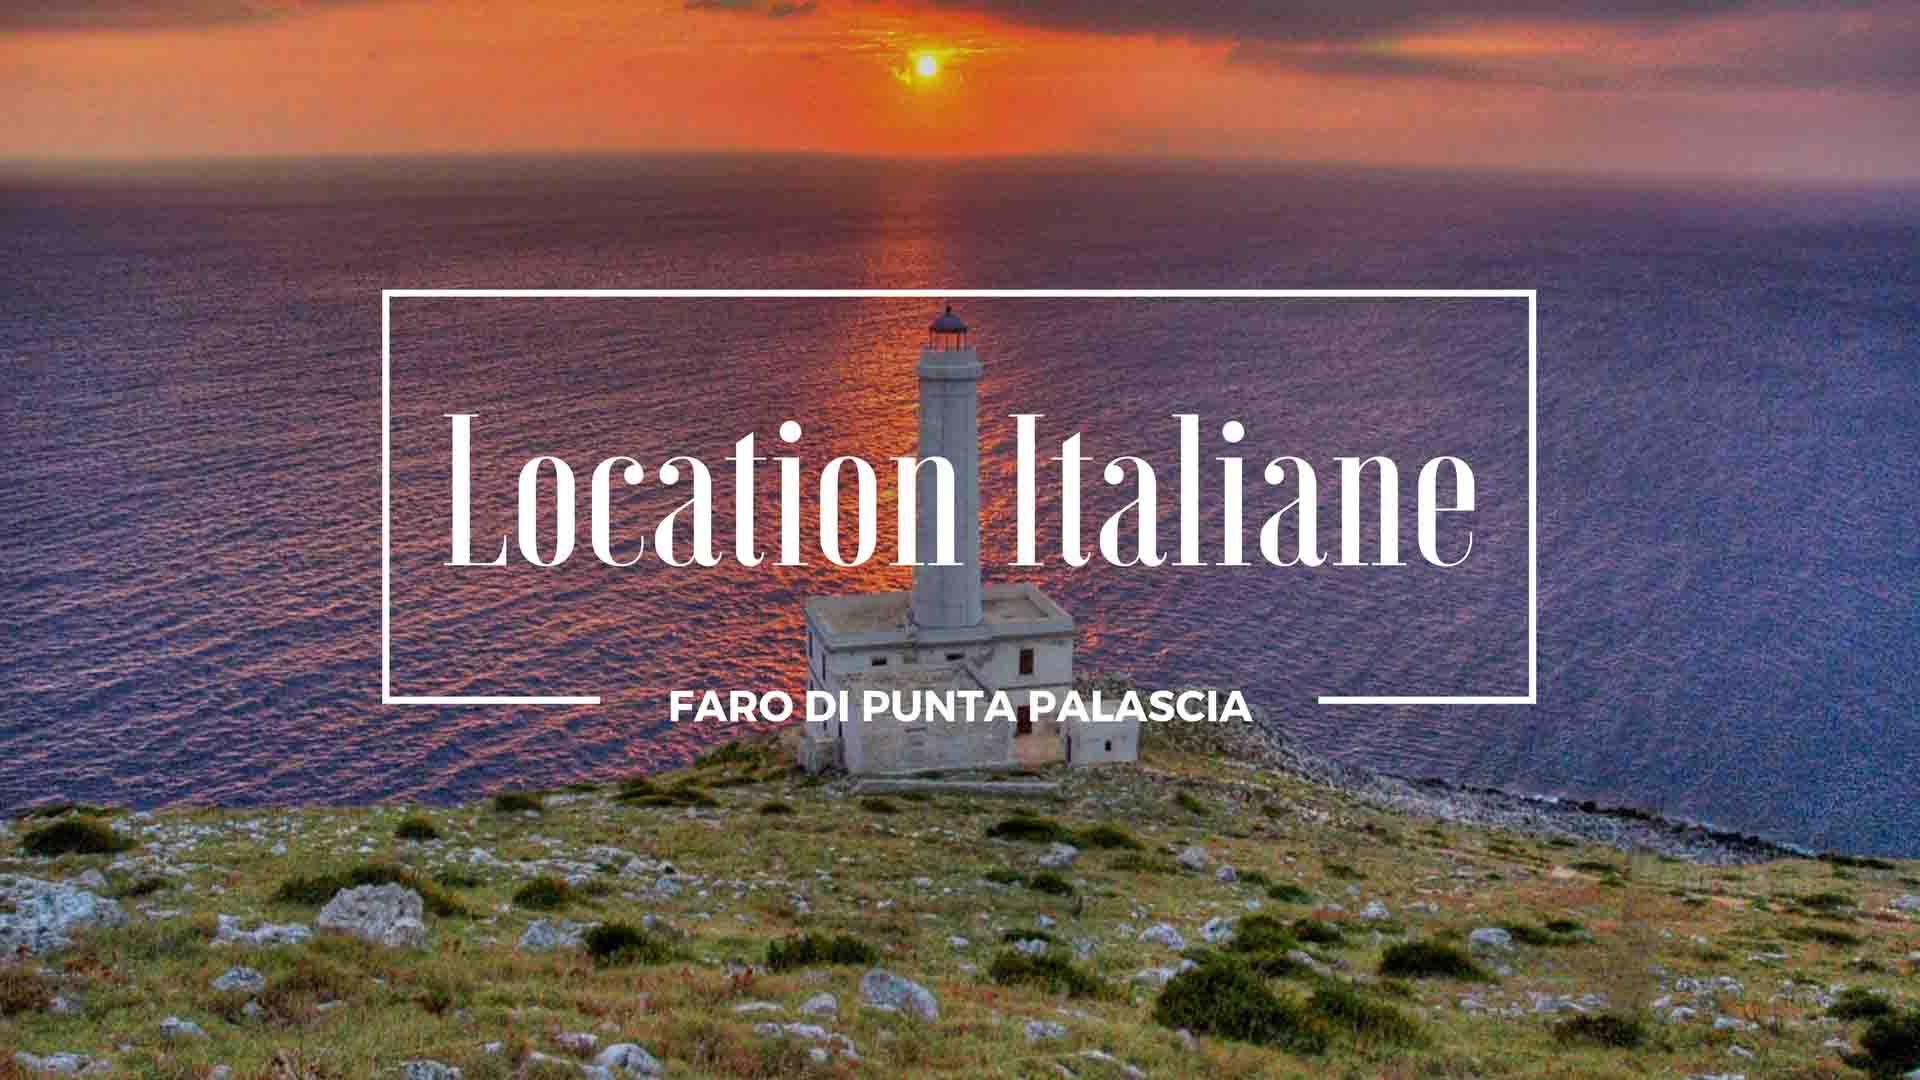 Faro di Punta Palascia